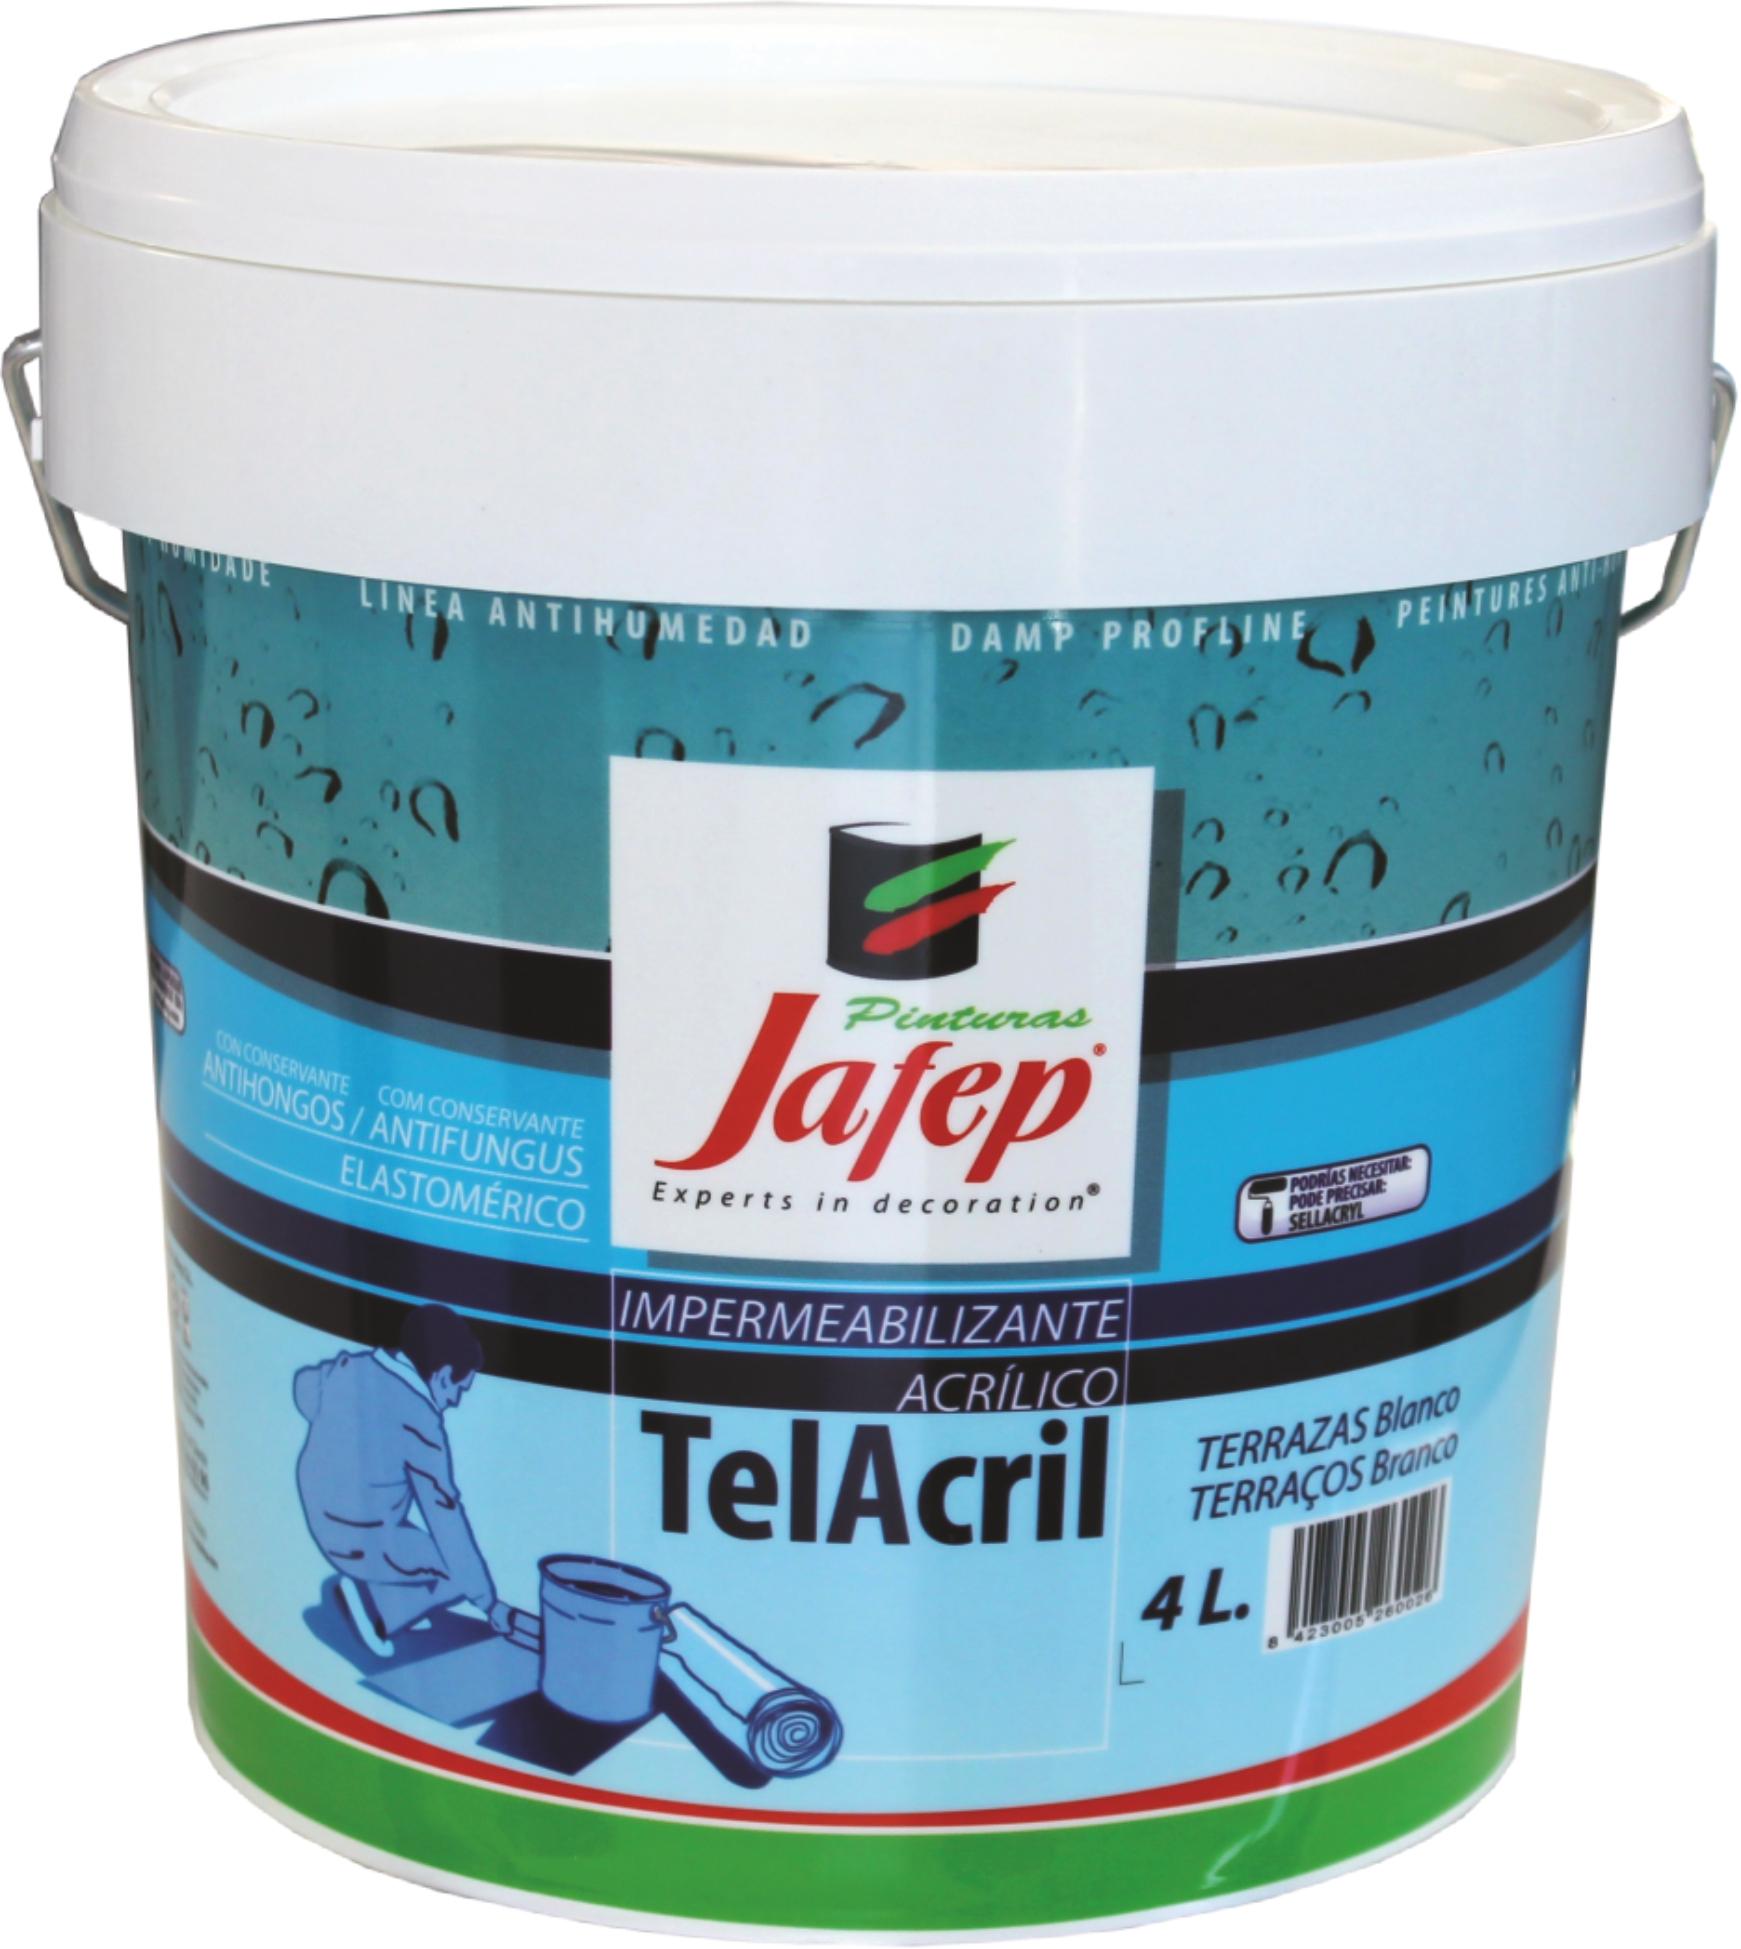 Telacril fibrado pinturas jafep - Pintura satinada blanca ...